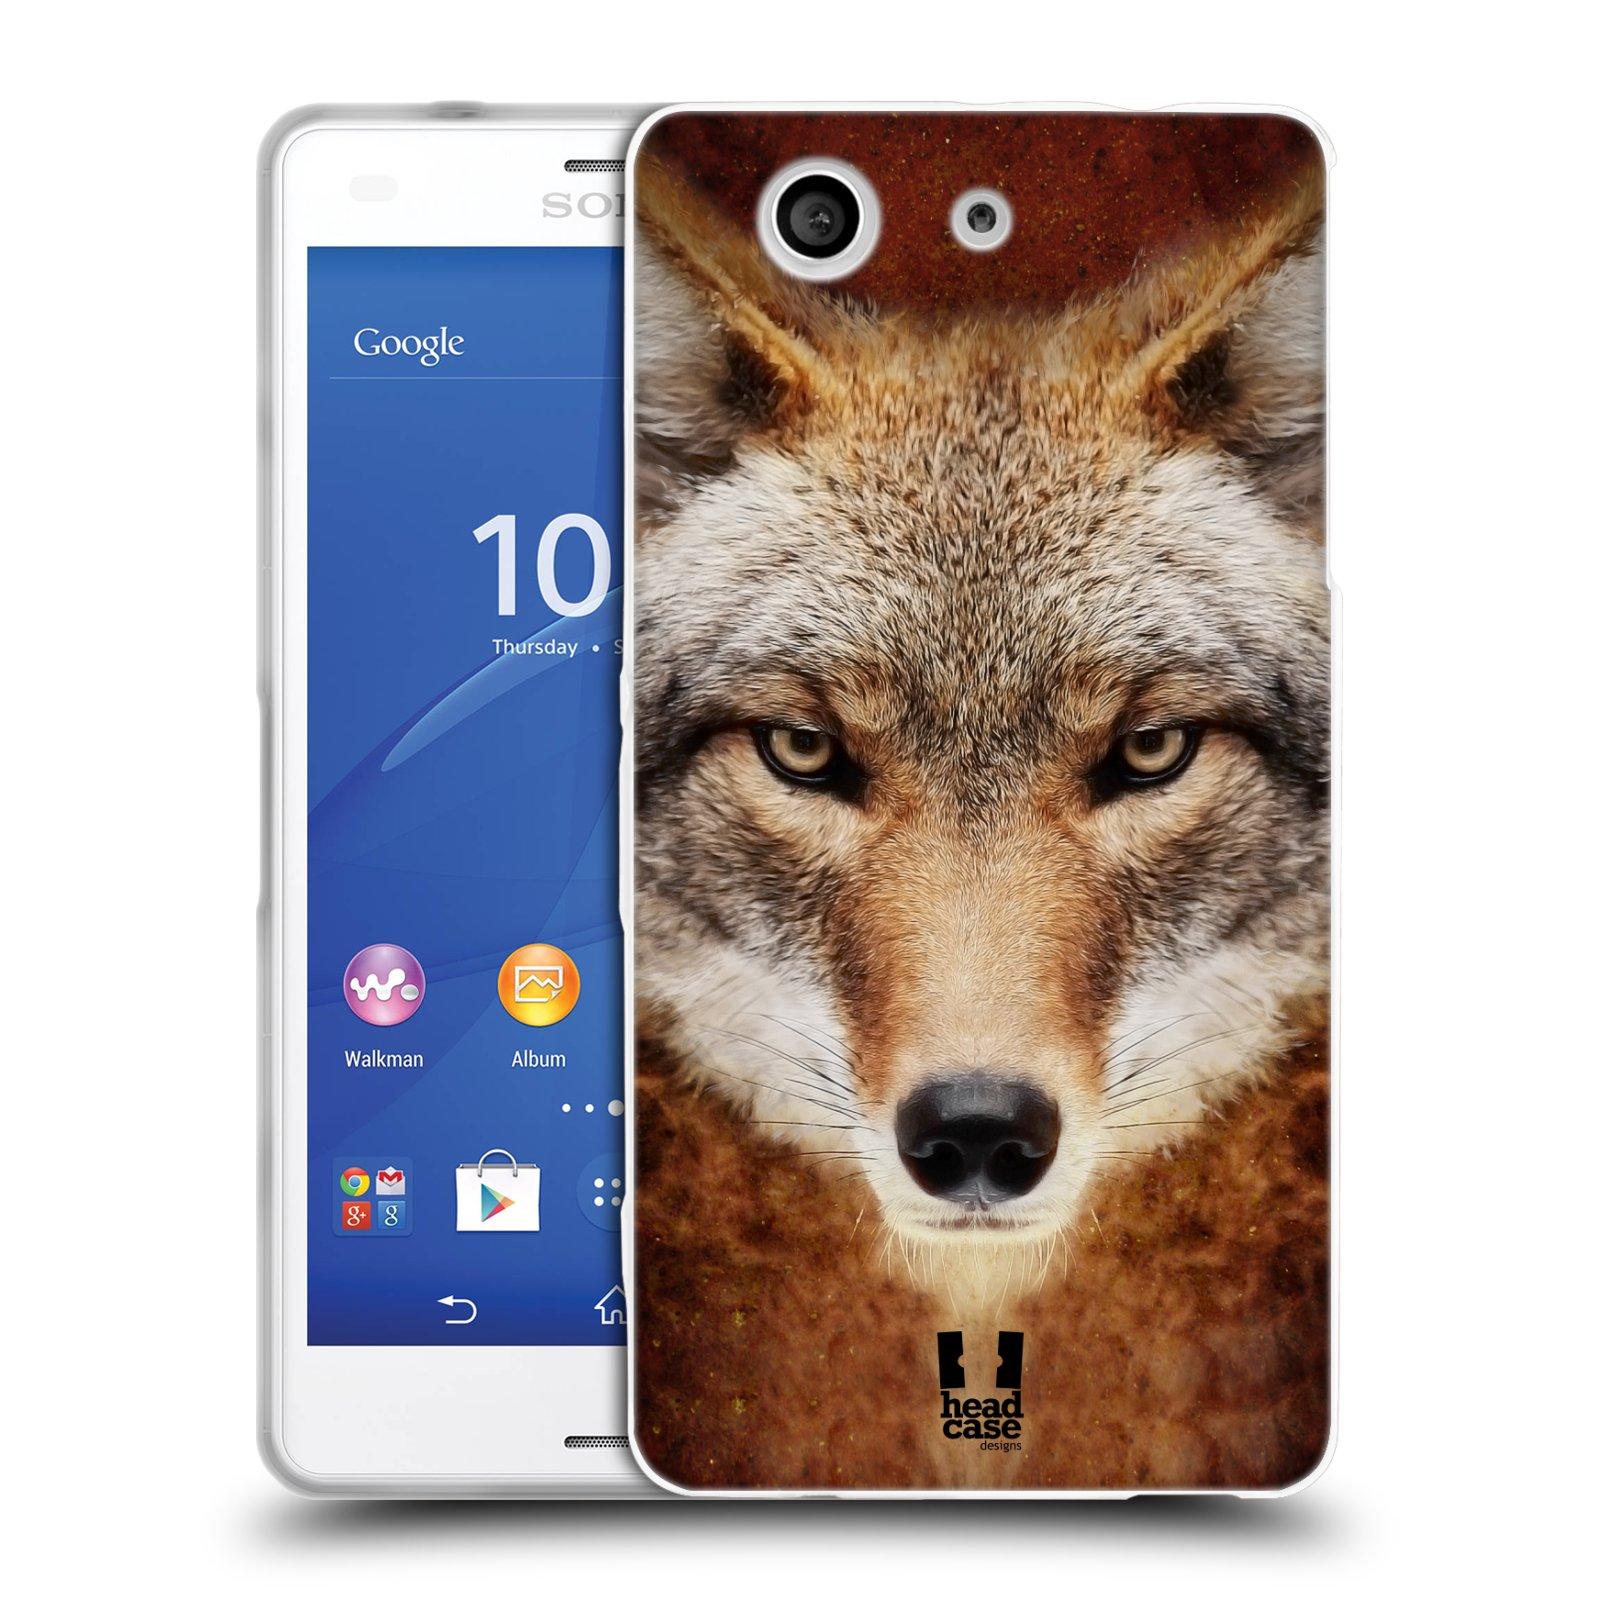 HEAD CASE silikonový obal na mobil Sony Xperia Z3 COMPACT (D5803) vzor Zvířecí tváře kojot